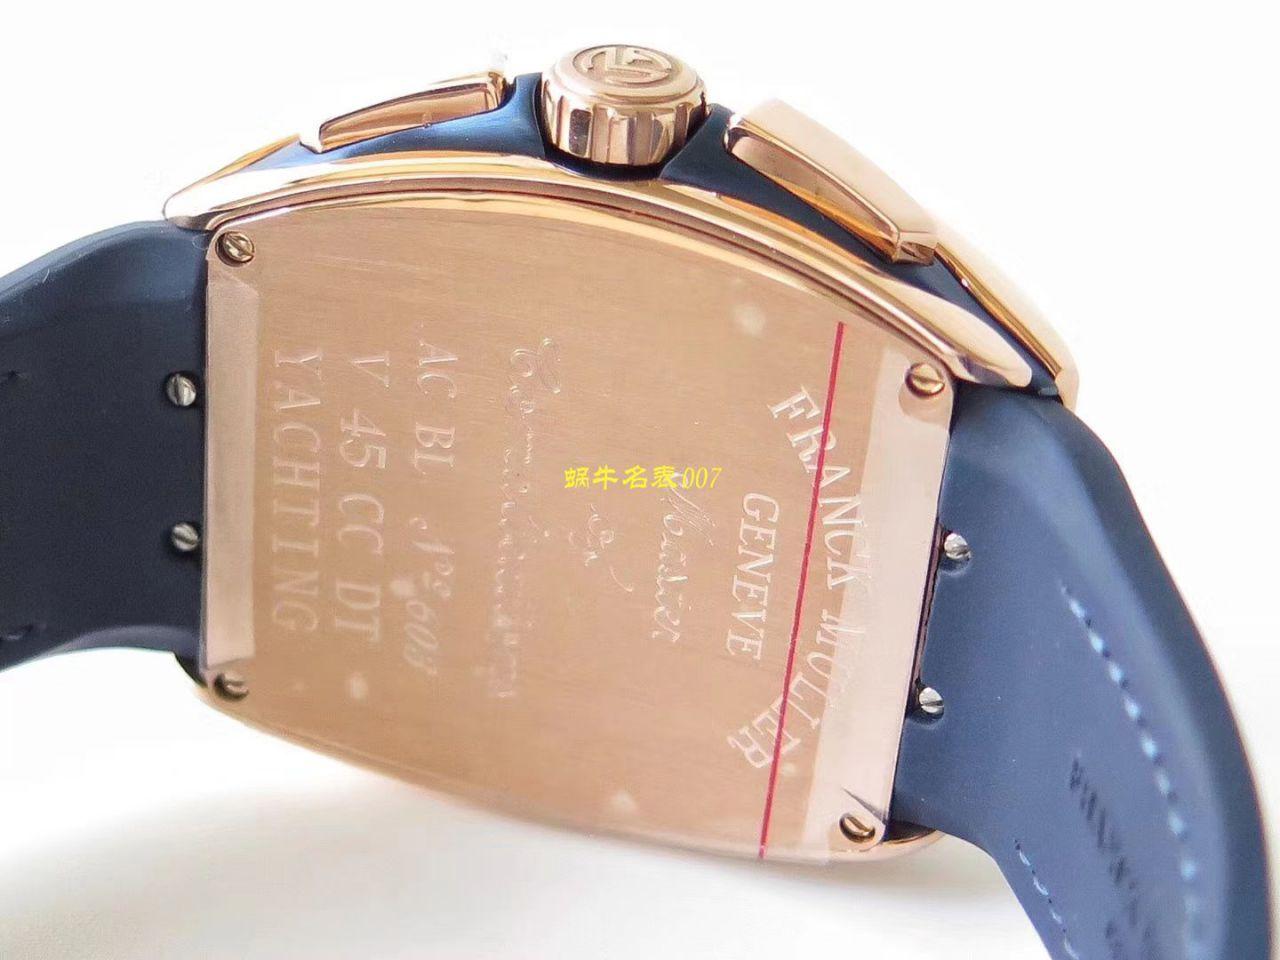 【台湾厂Franck Muller复刻手表】法兰克穆勒MEN'S COLLECTION系列V 45 CC DT YACHT腕表